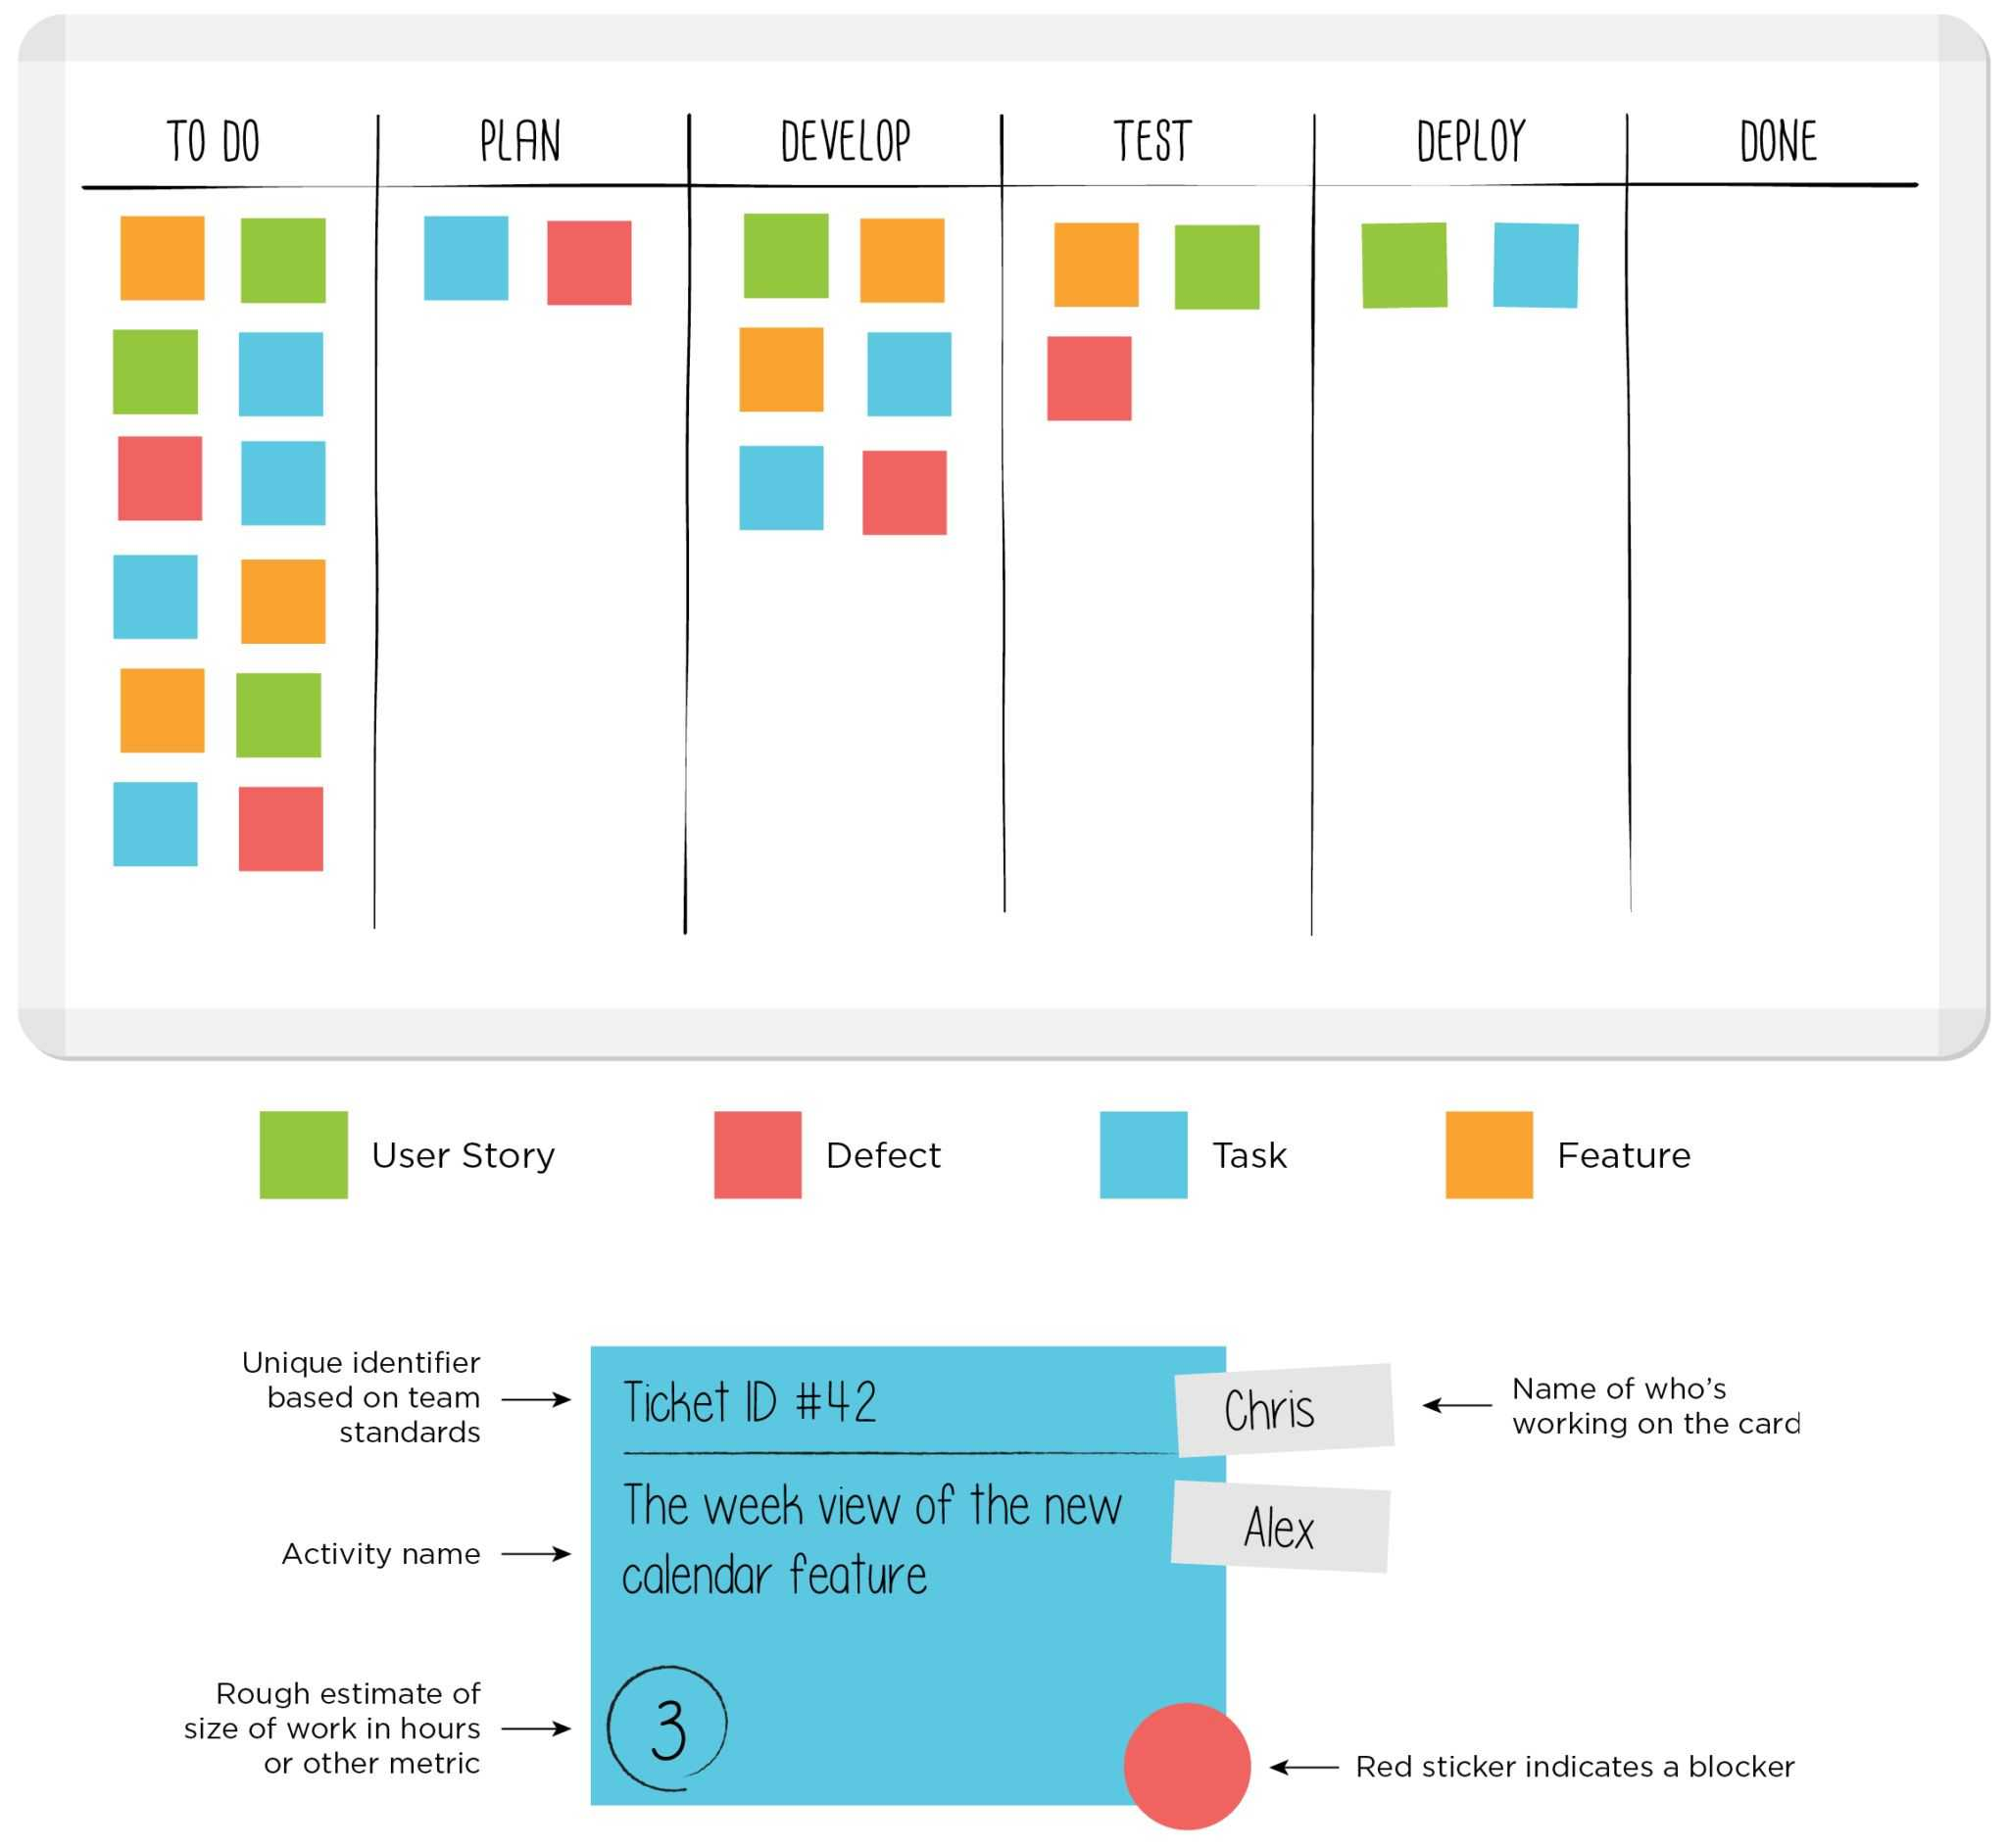 Sample Kanban Board With Kanban Card Template - Leankit With Kanban Card Template